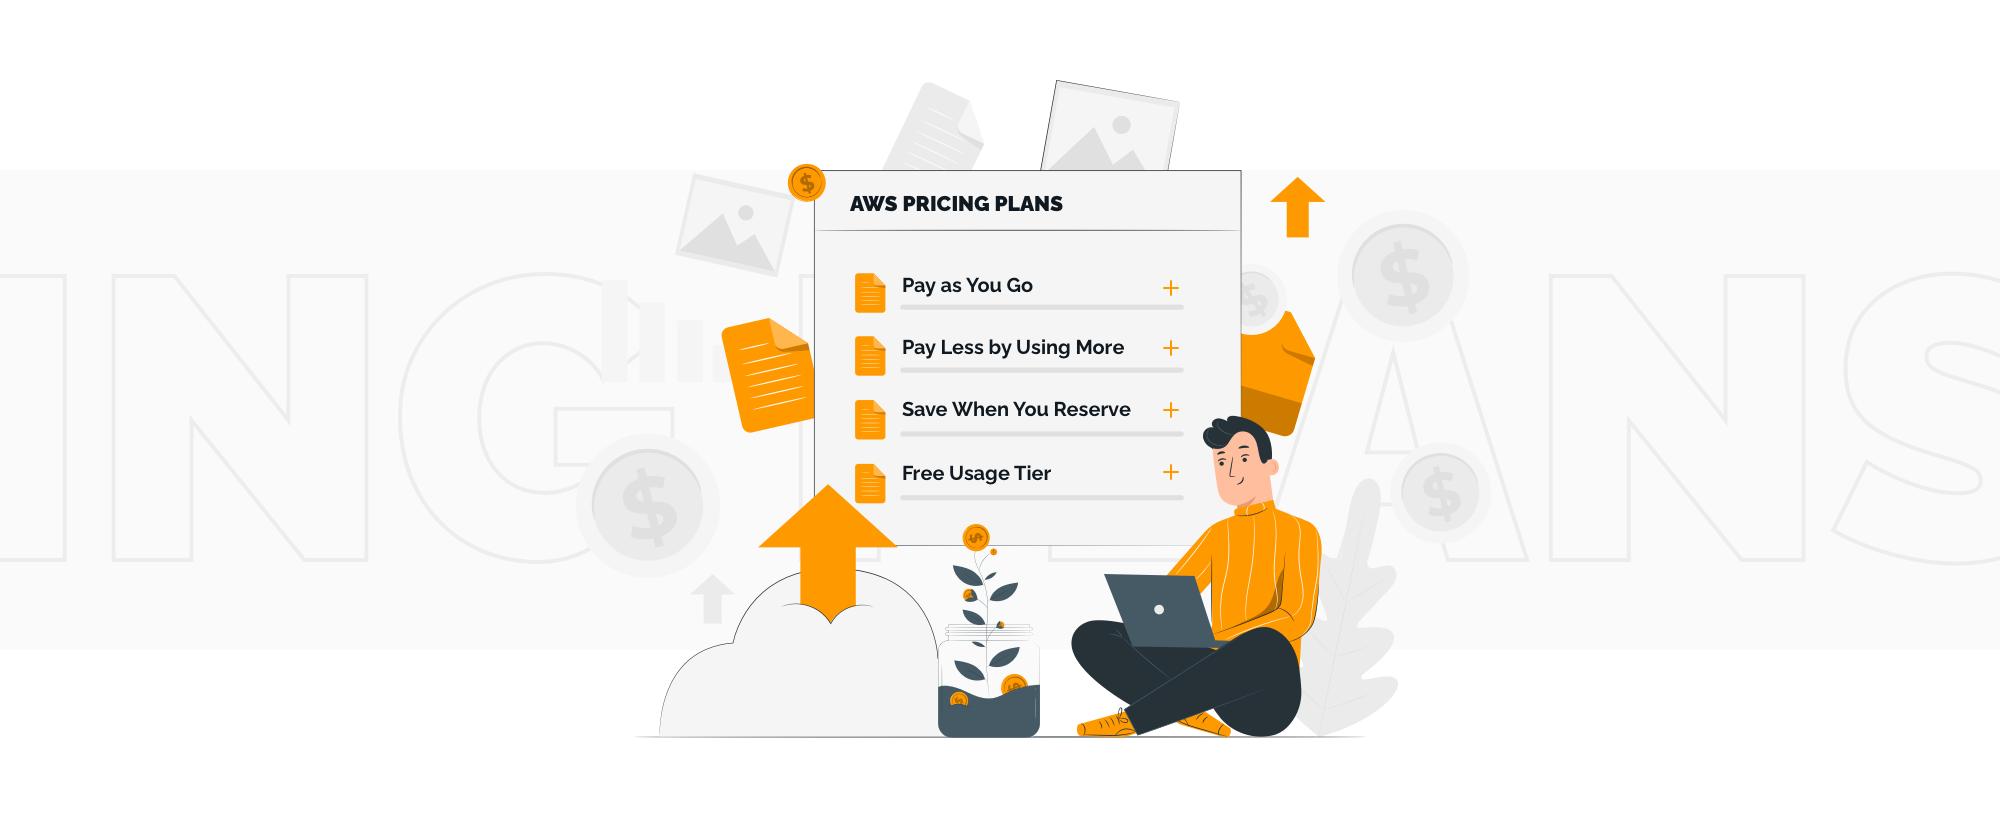 AWS Pricing Plans | TechMagic.co